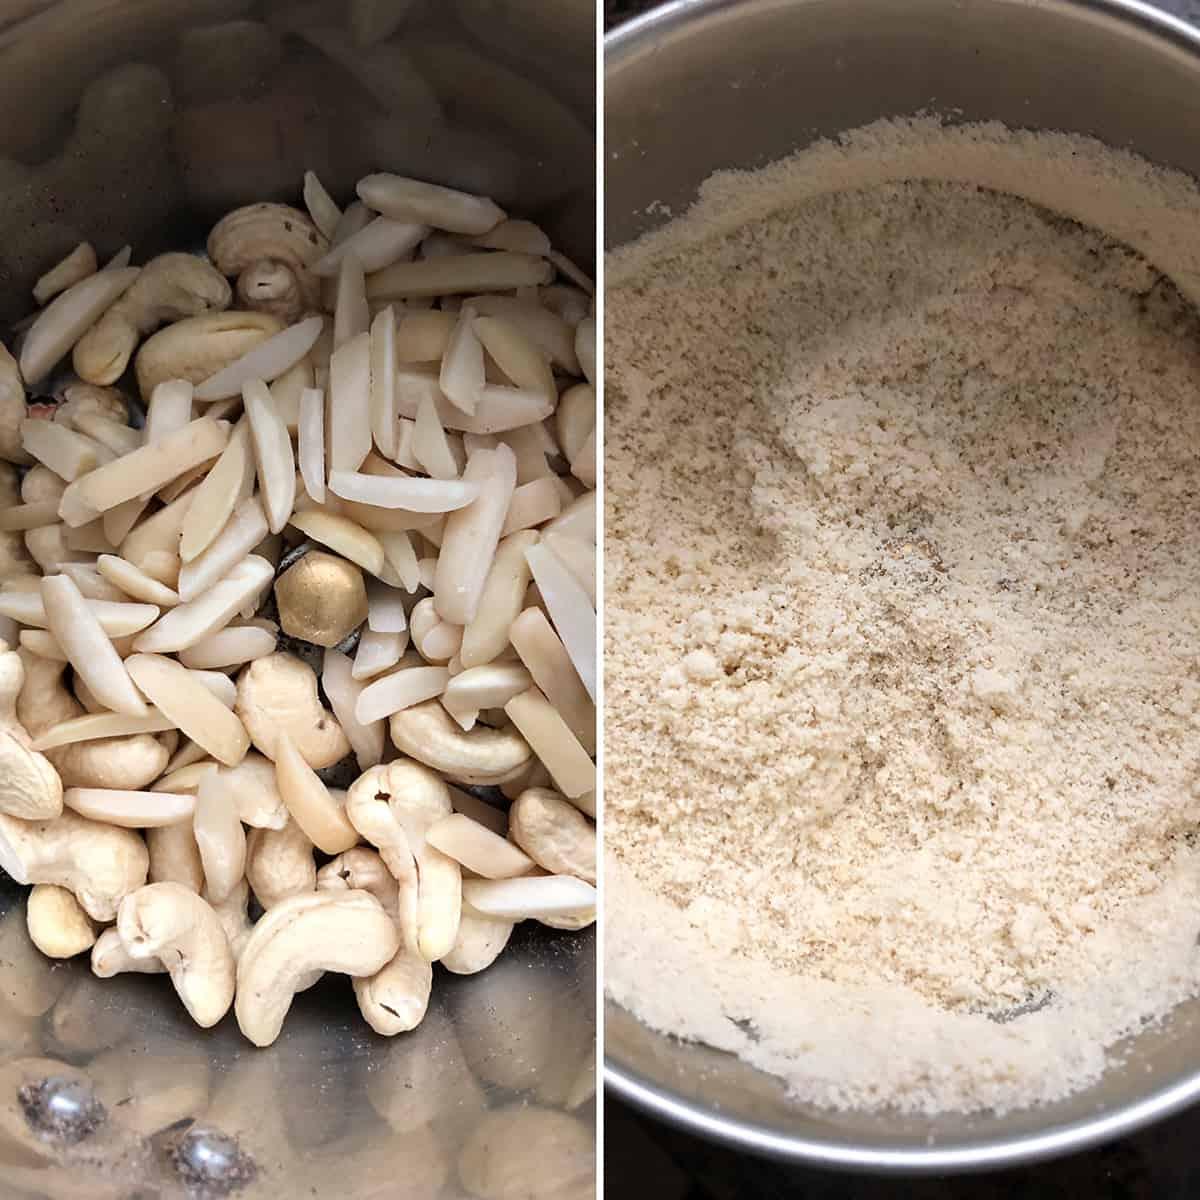 Cashews and almonds ground to a fine powder